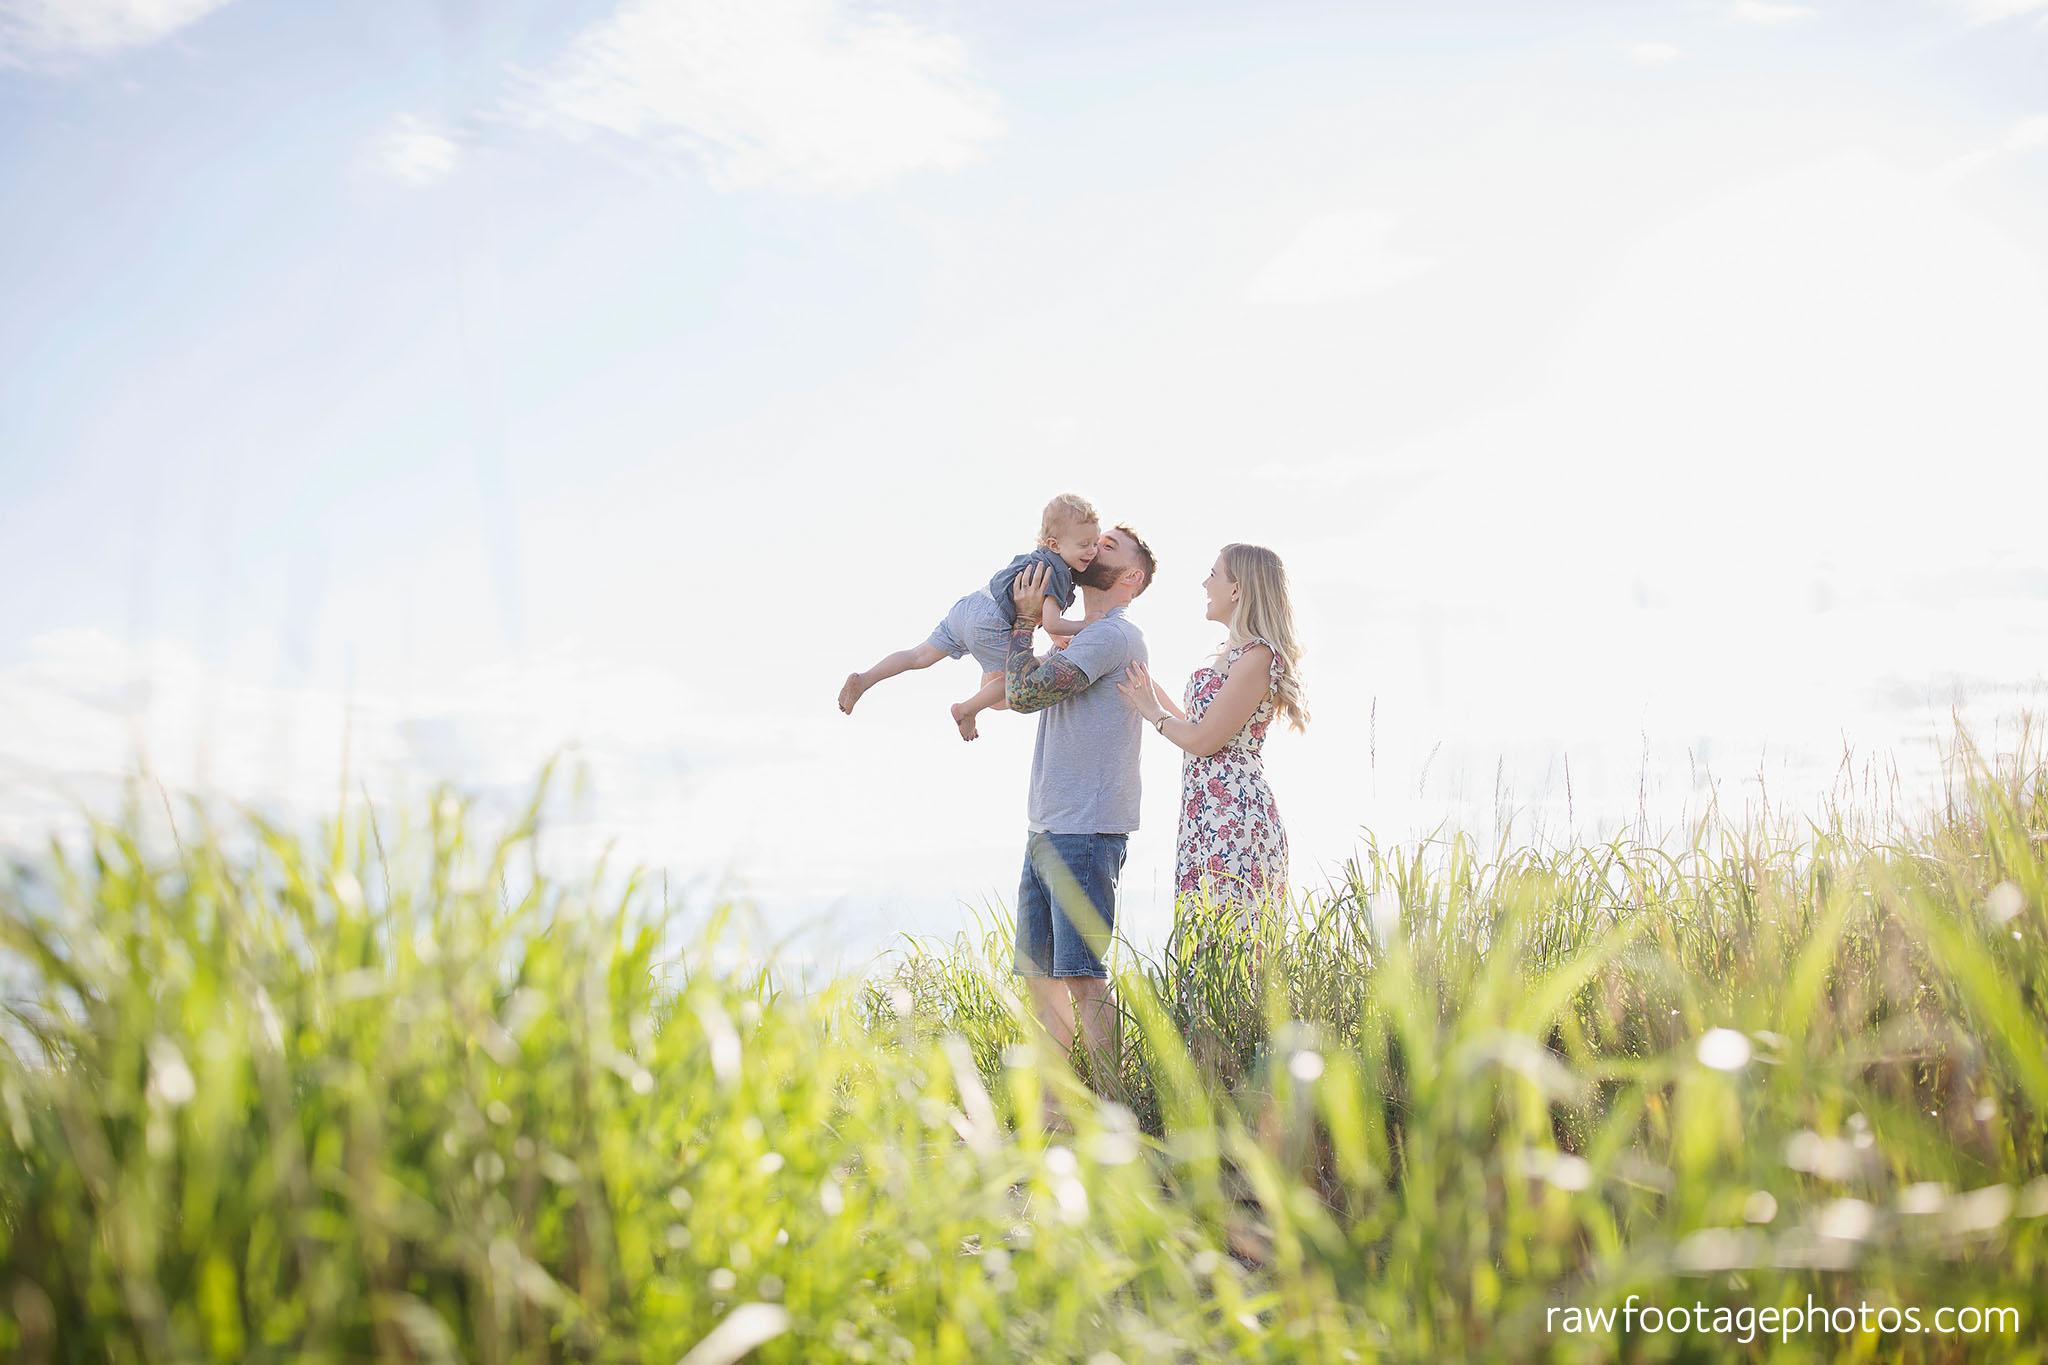 london_ontario_photographer-raw_footage_photography-beach_minis-port_stanley_beach-family_photographer-couple_photographer-lifestyle_photographer057.jpg